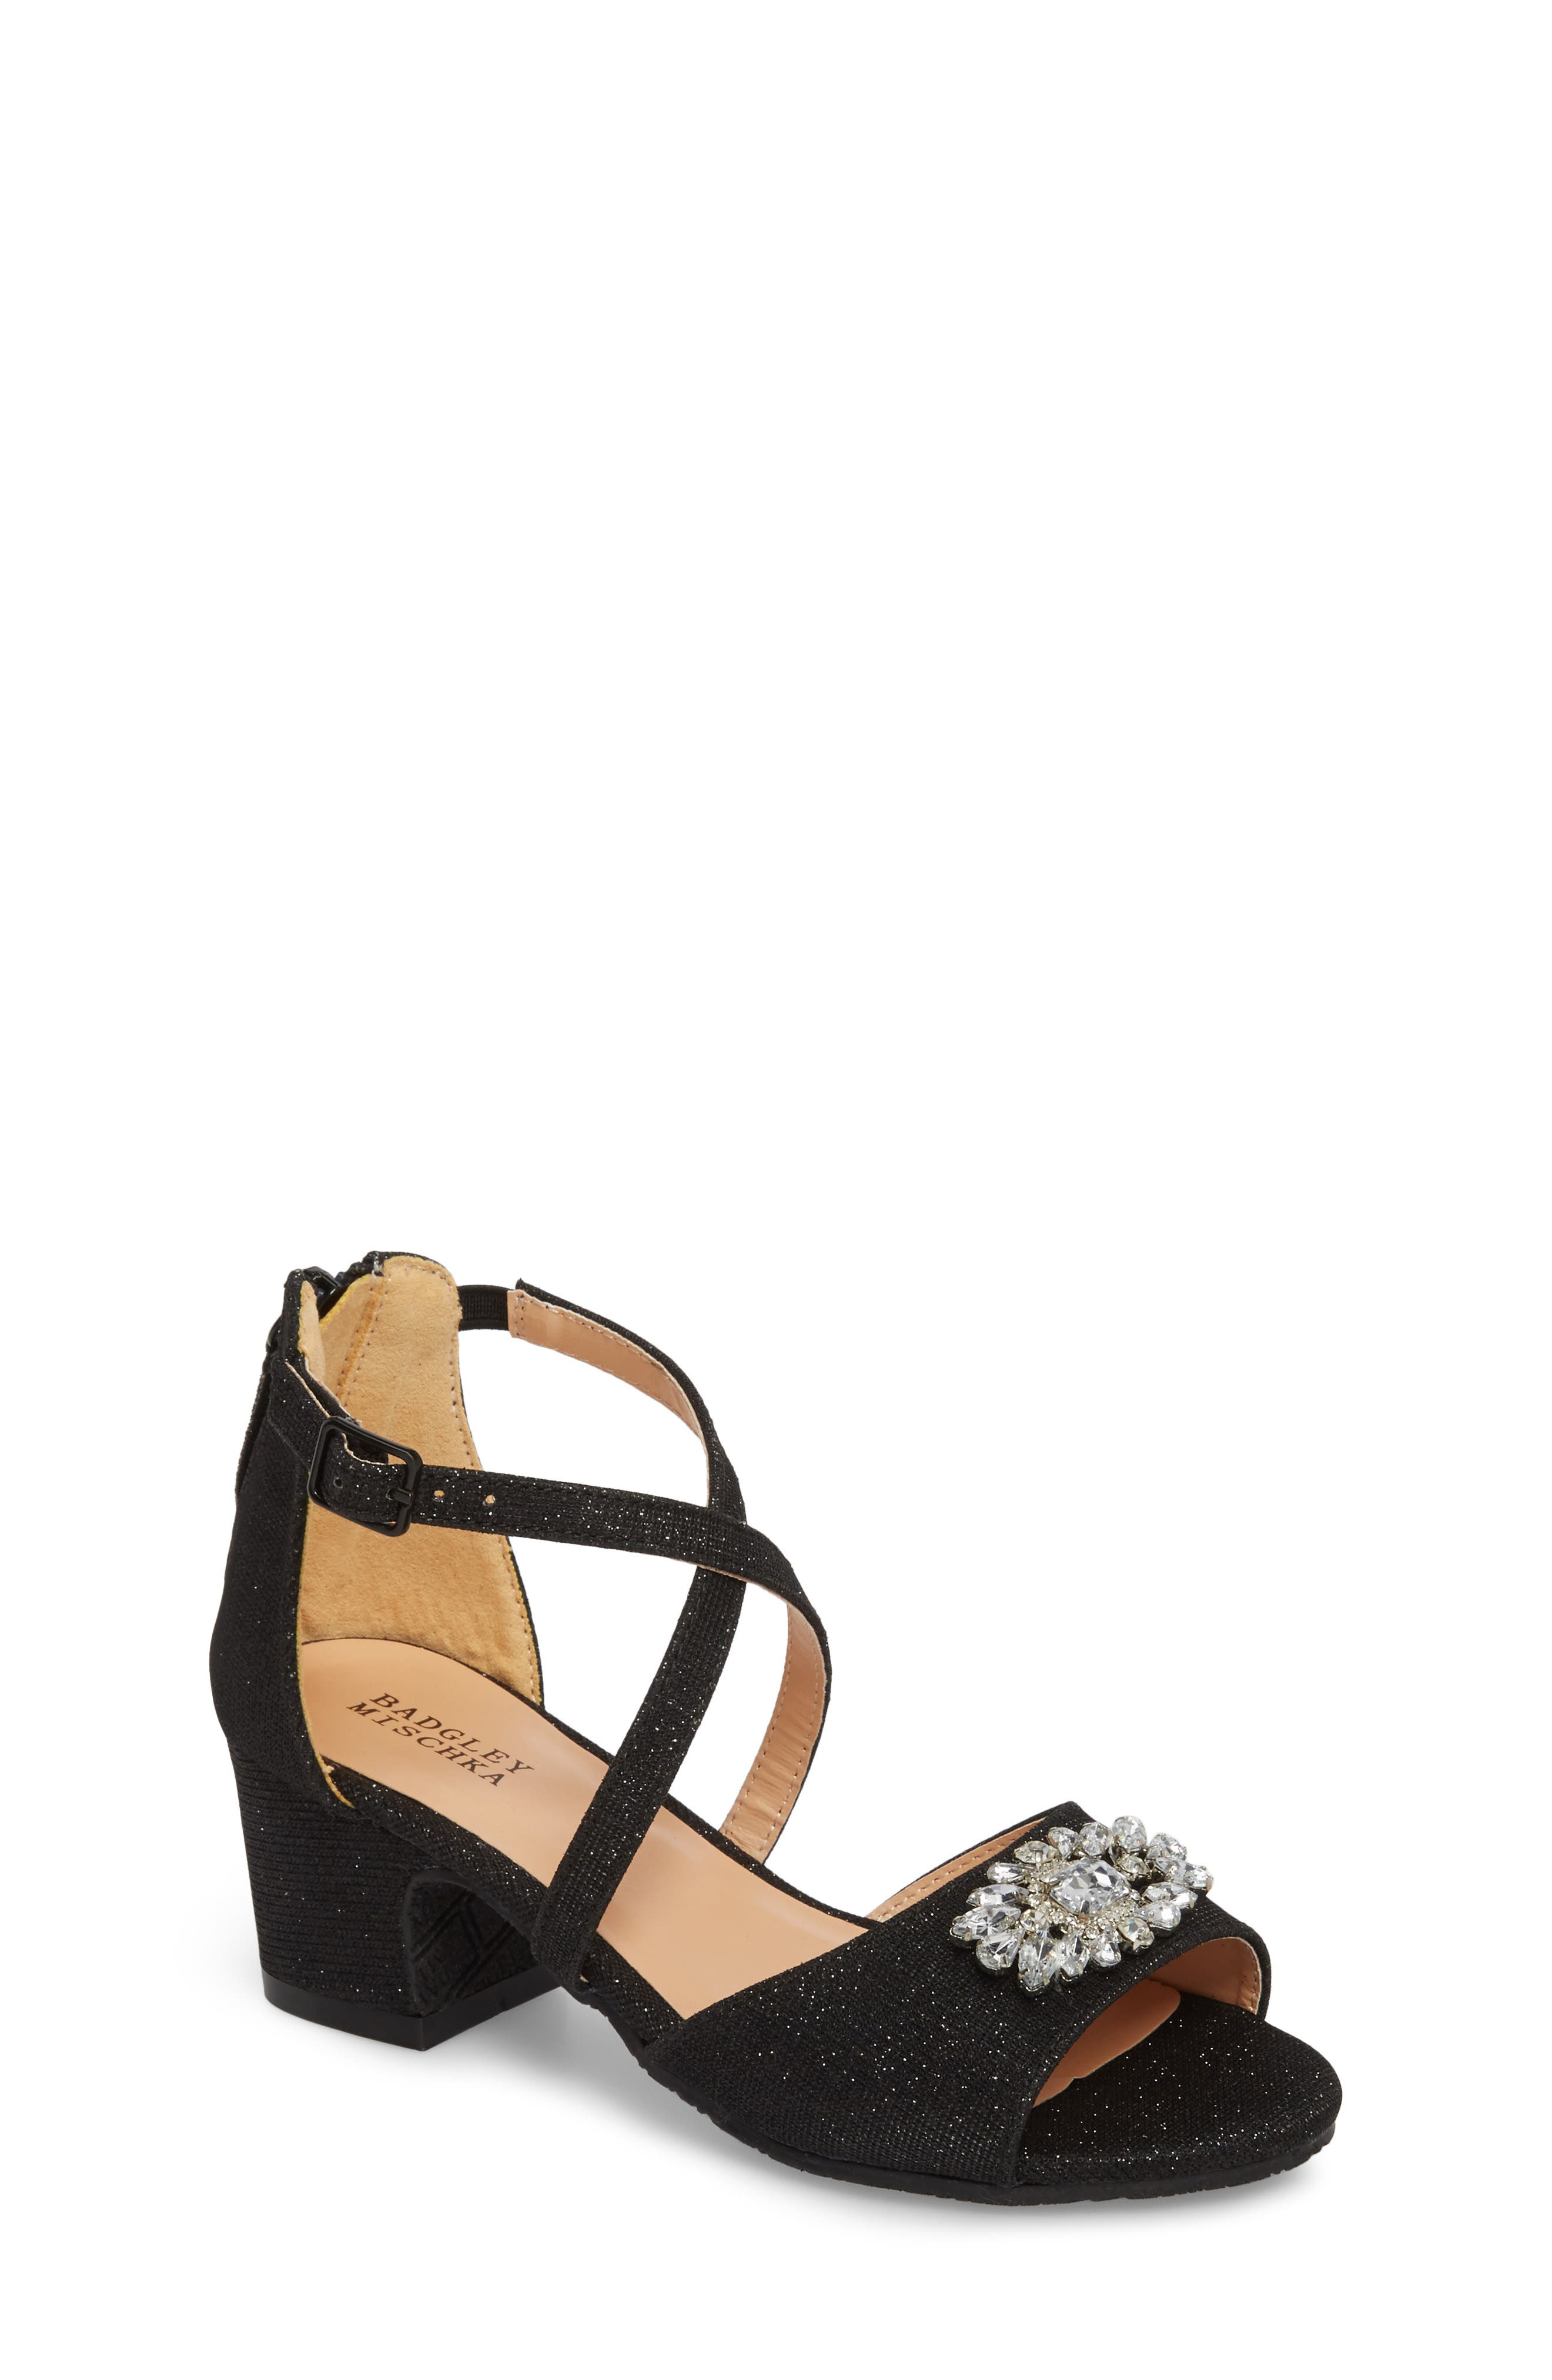 Pernia Gems Sandal,                         Main,                         color, BLACK